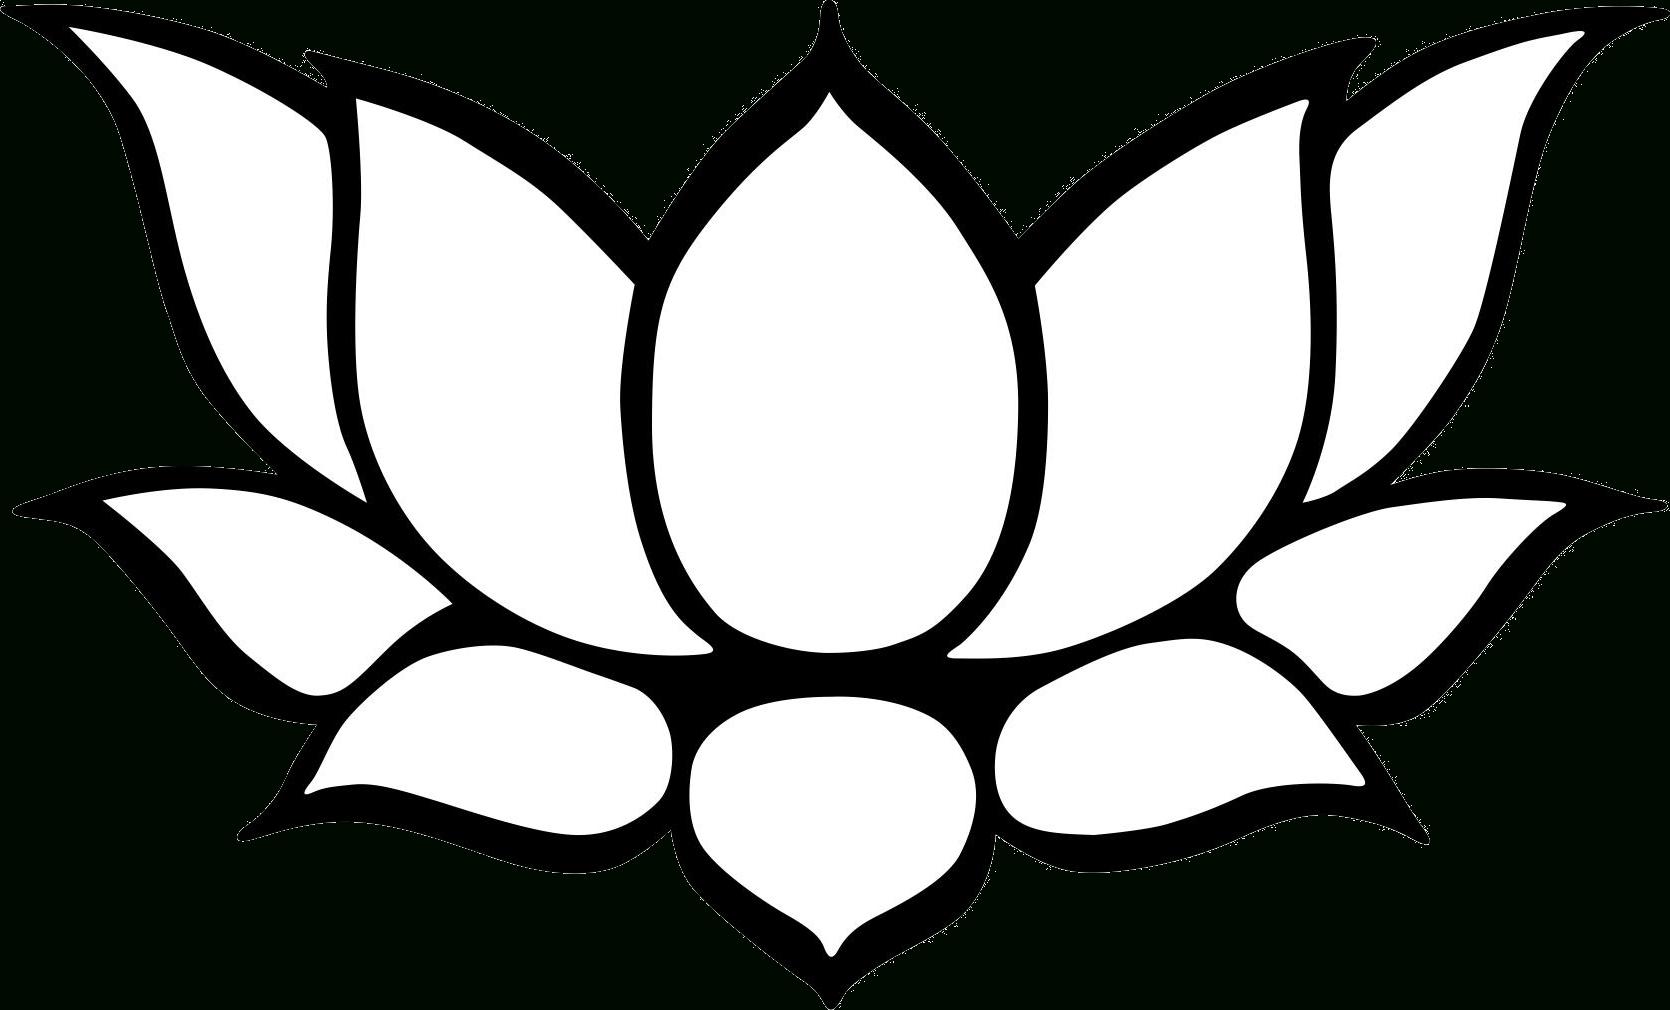 1670x1010 Pencil Line Picture Lotus Flower Lotus Flower Drawing Best